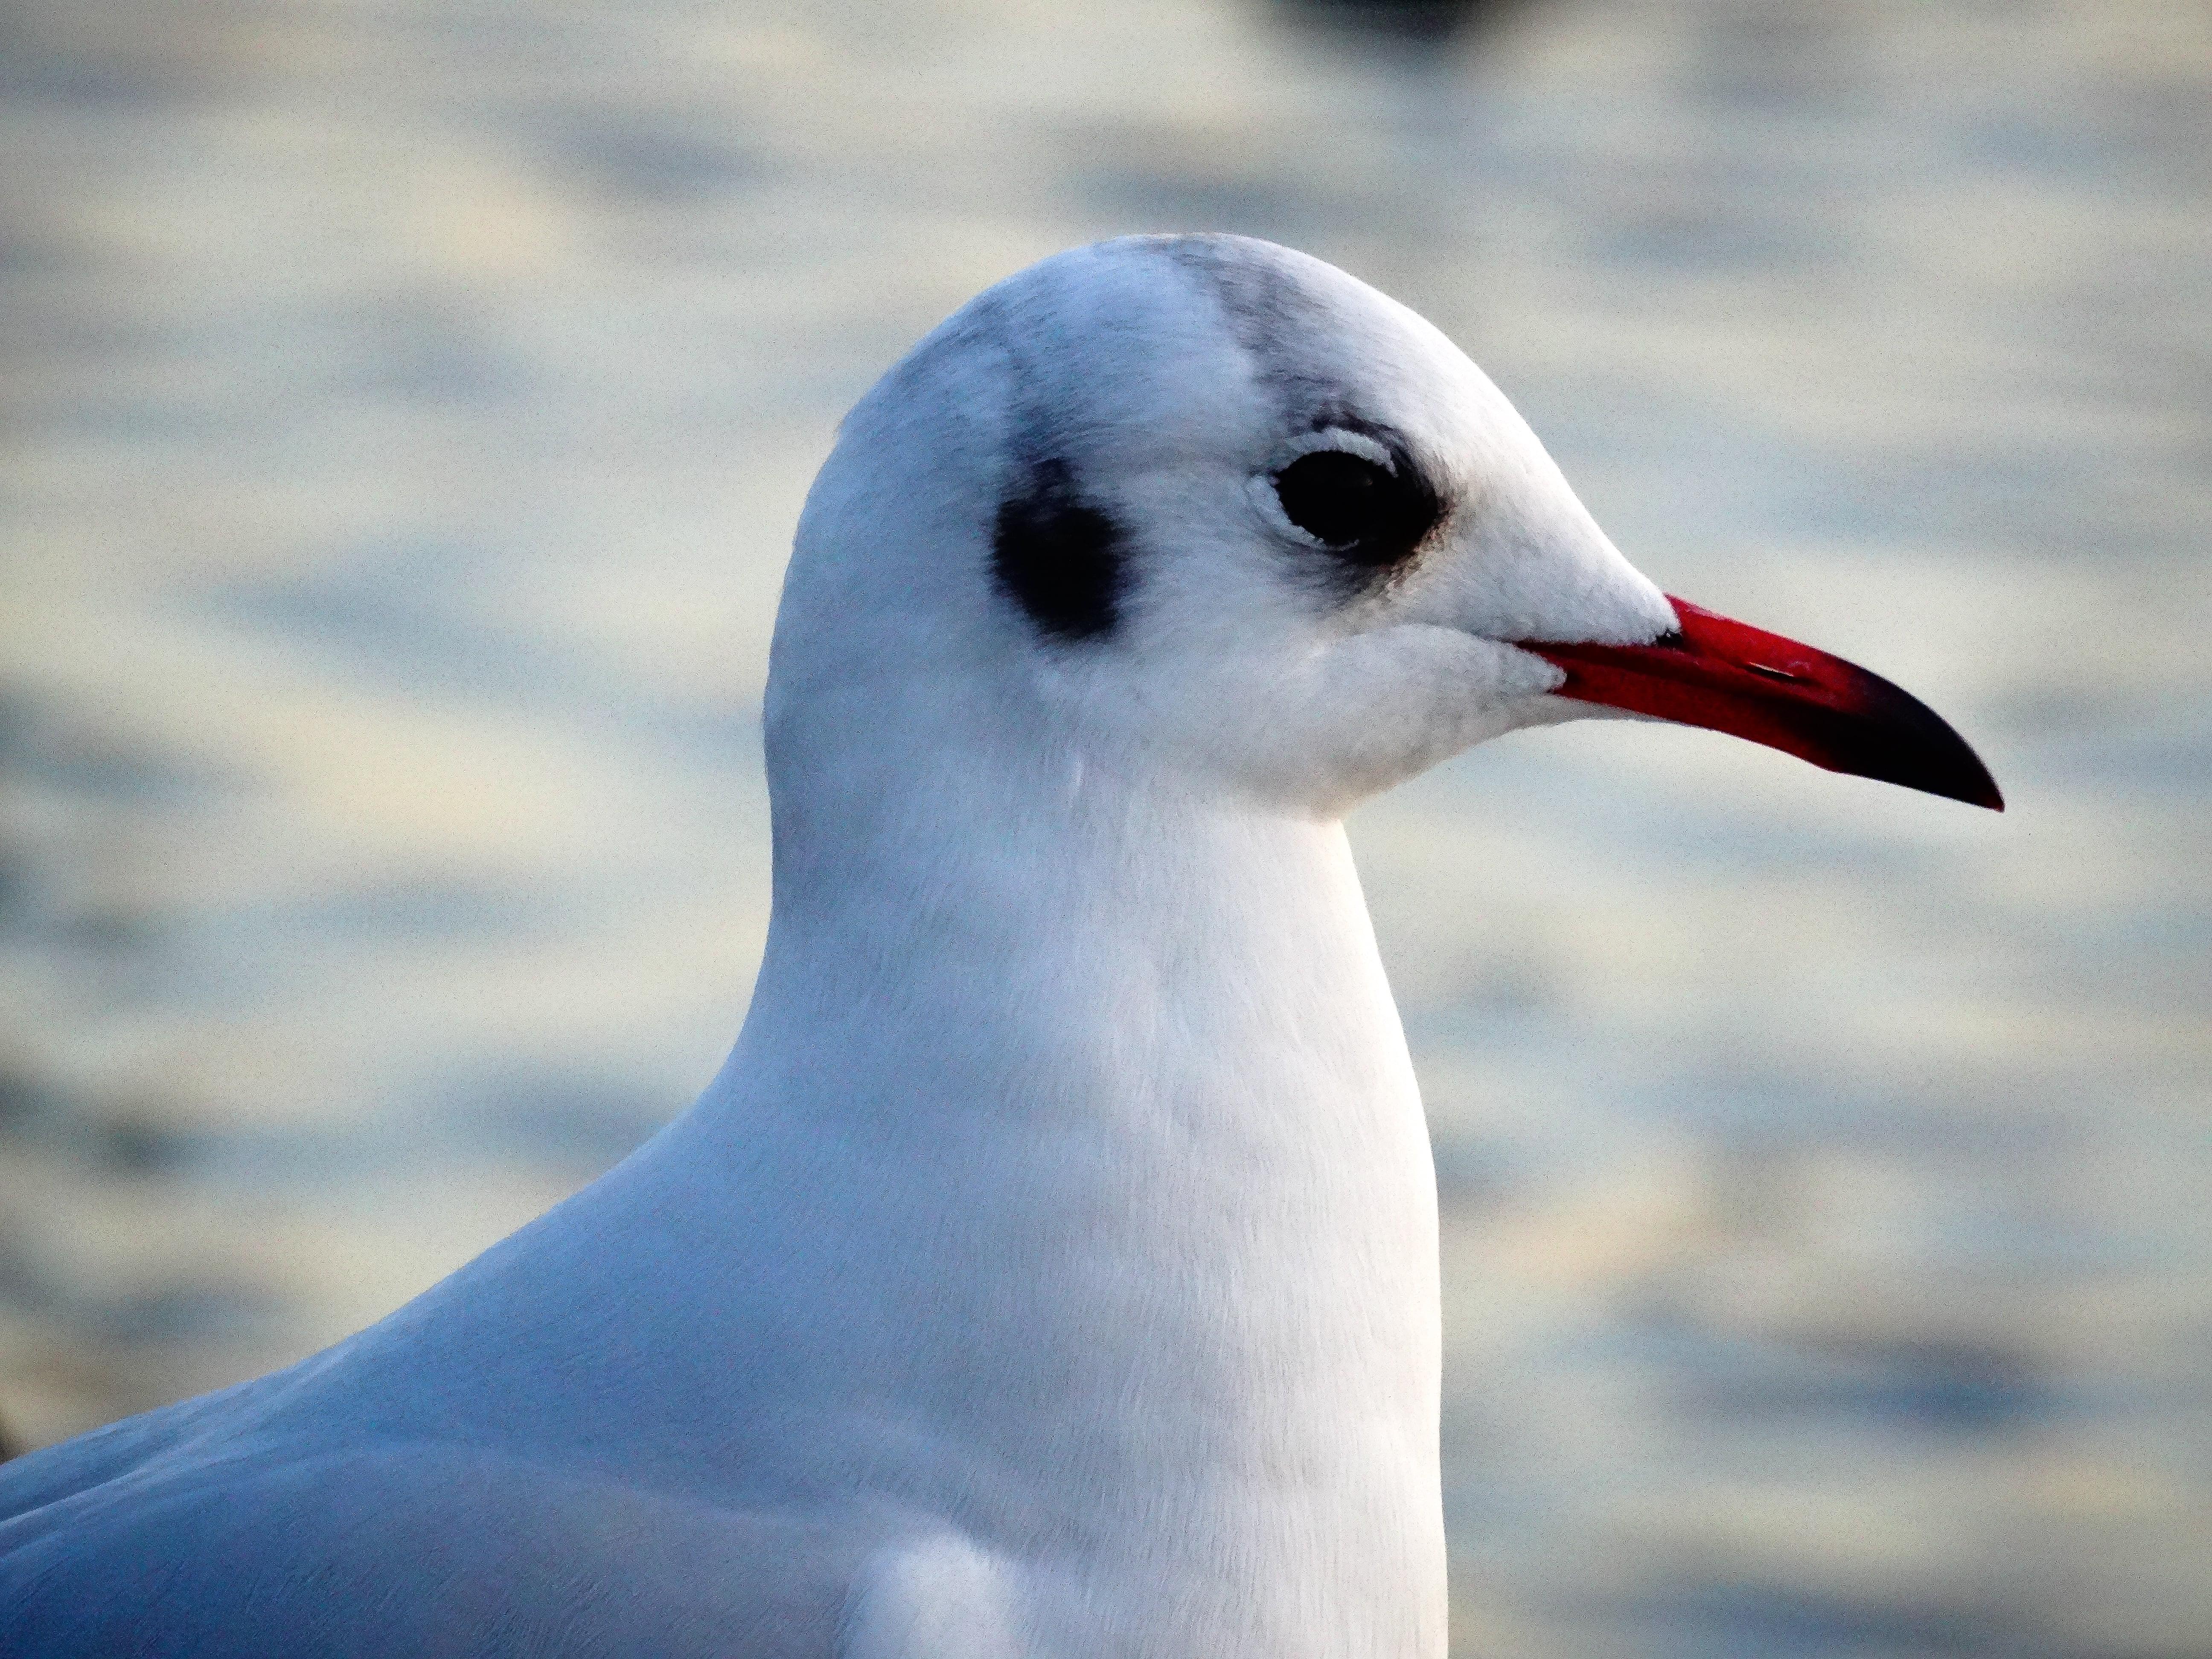 White bird, Seagull, Bird, Beak HD wallpaper | Wallpaper Flare